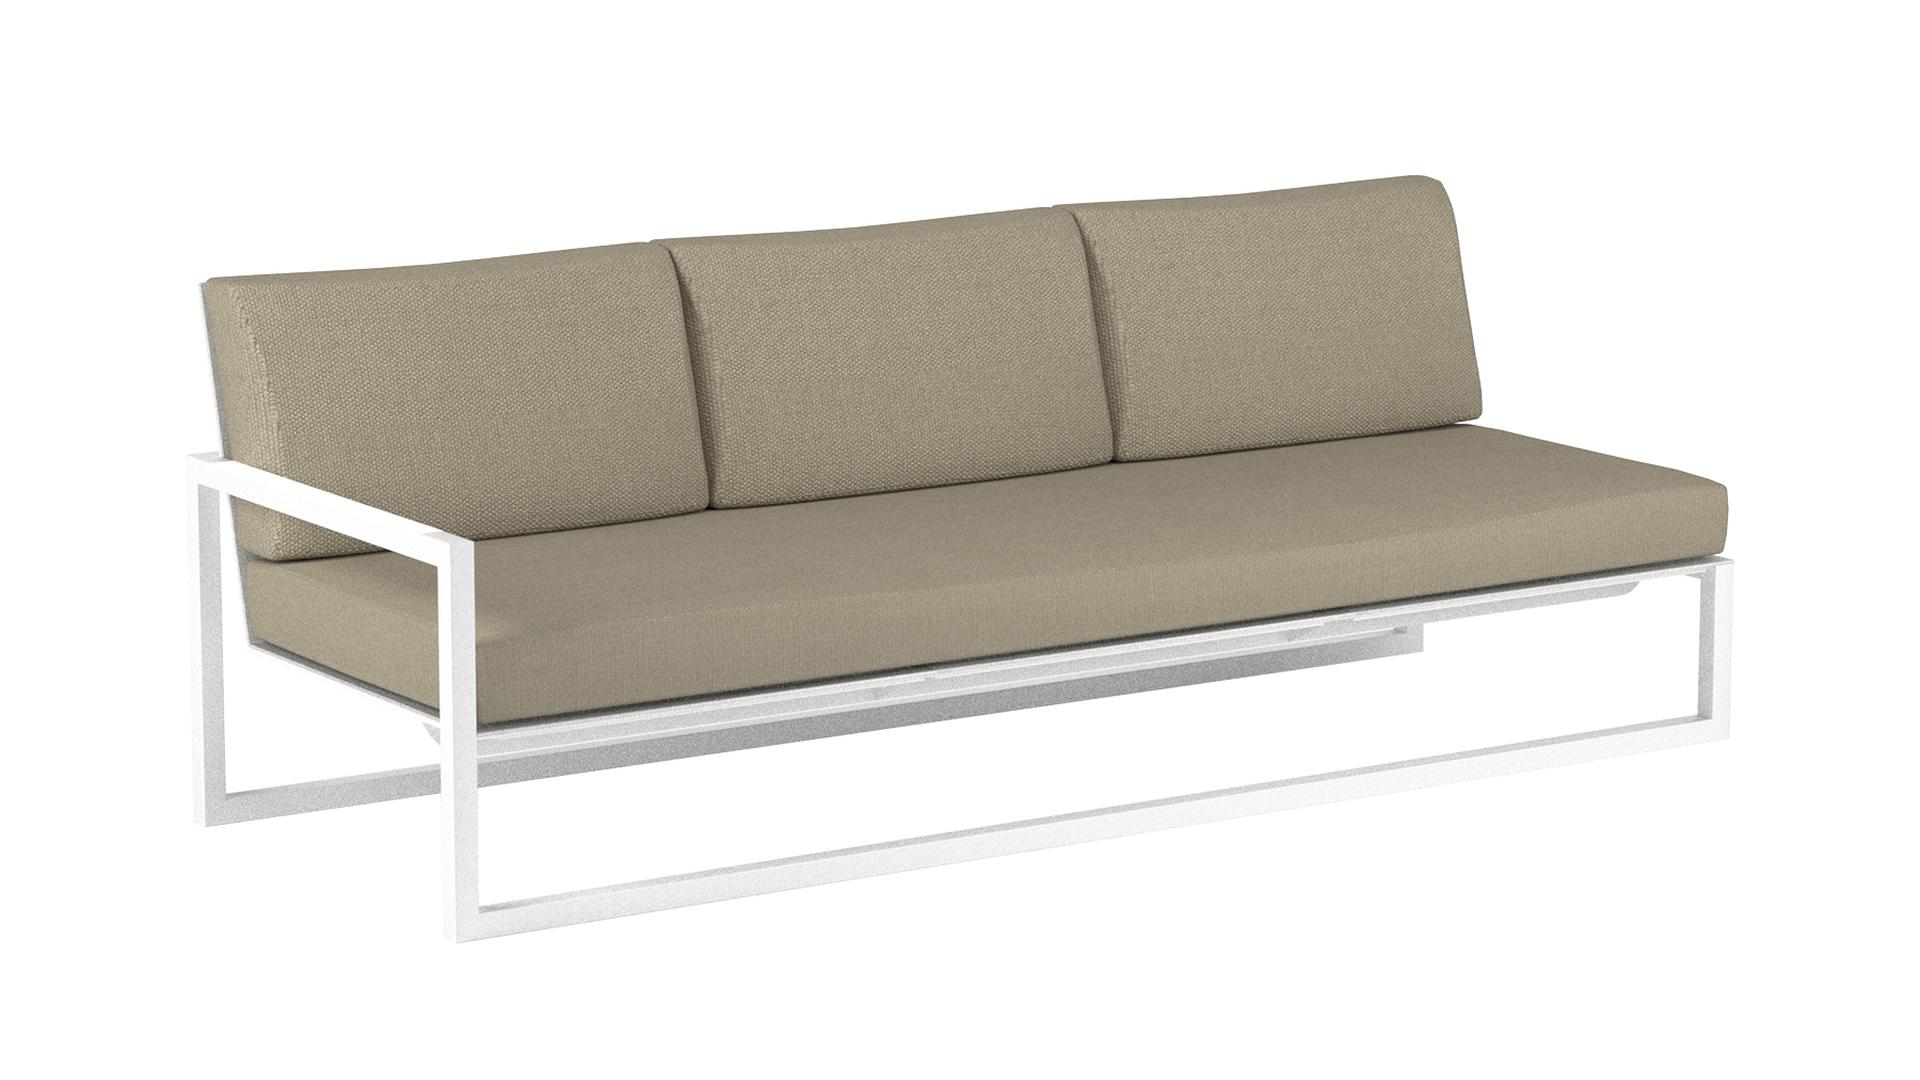 Ninix lounge 240 right arm royal botania white.jpg